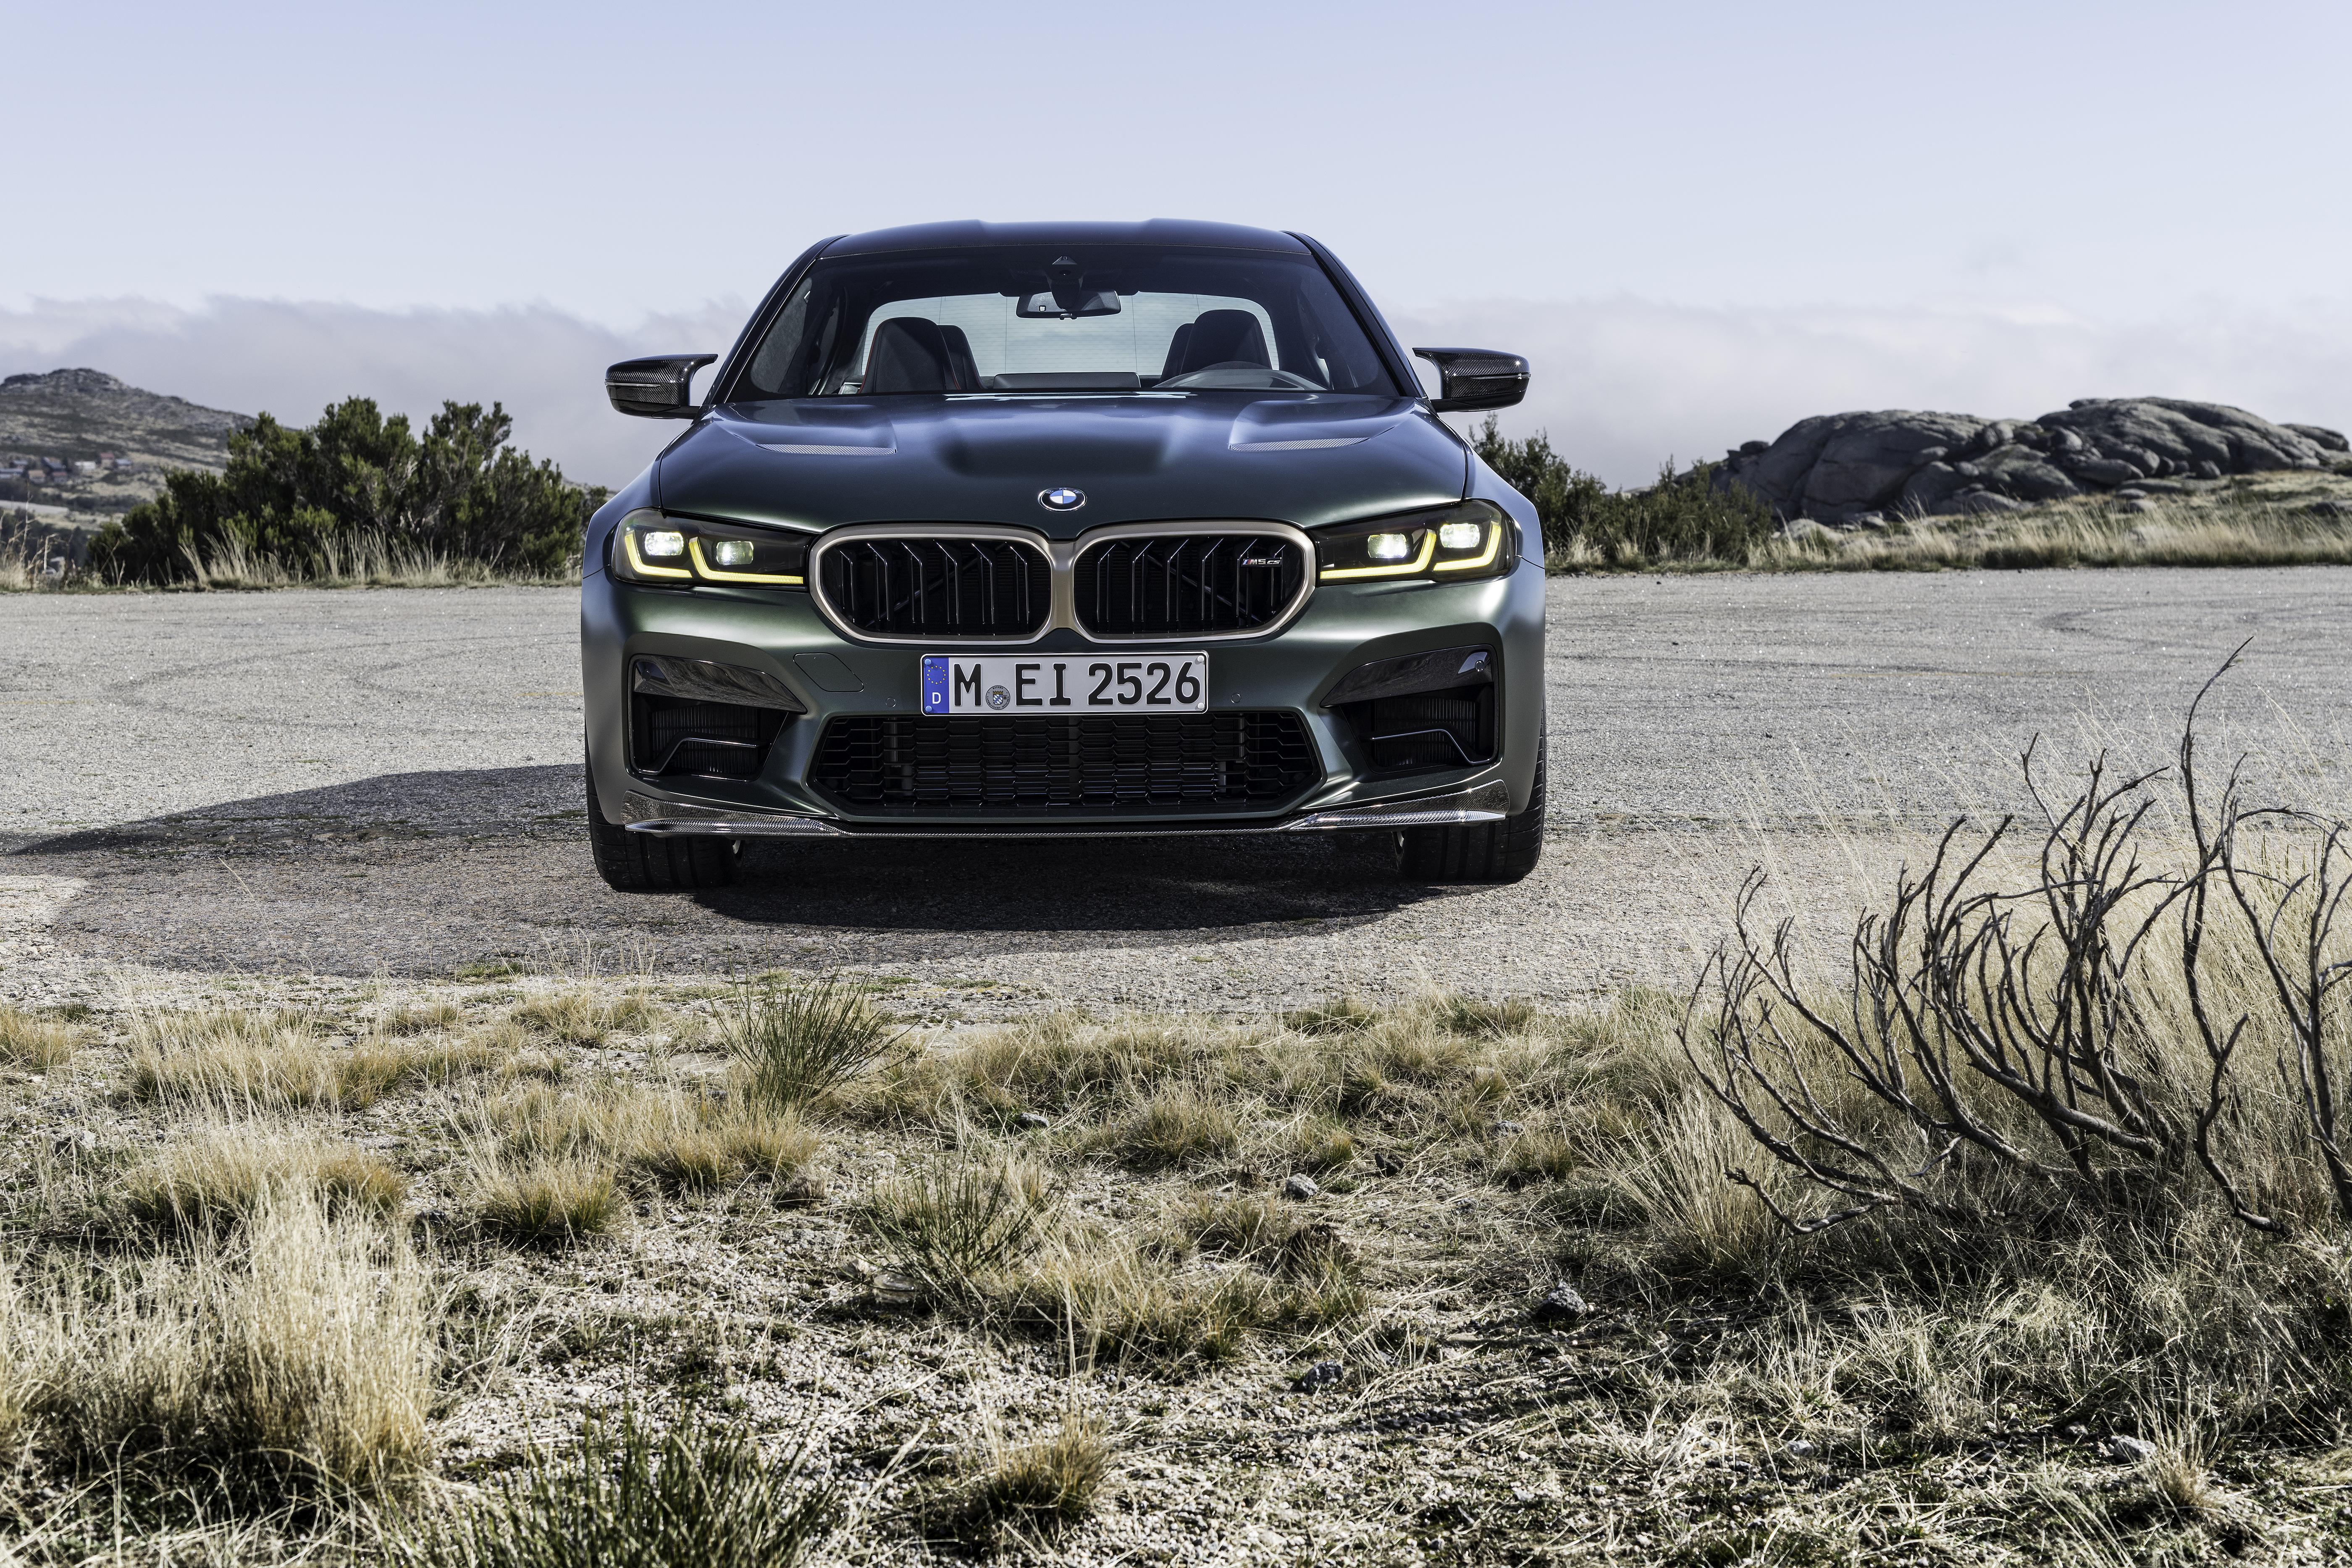 bmw m5 cs 2021 4k 1614631792 - BMW M5 CS 2021 4k - BMW M5 CS 2021 4k wallpapers